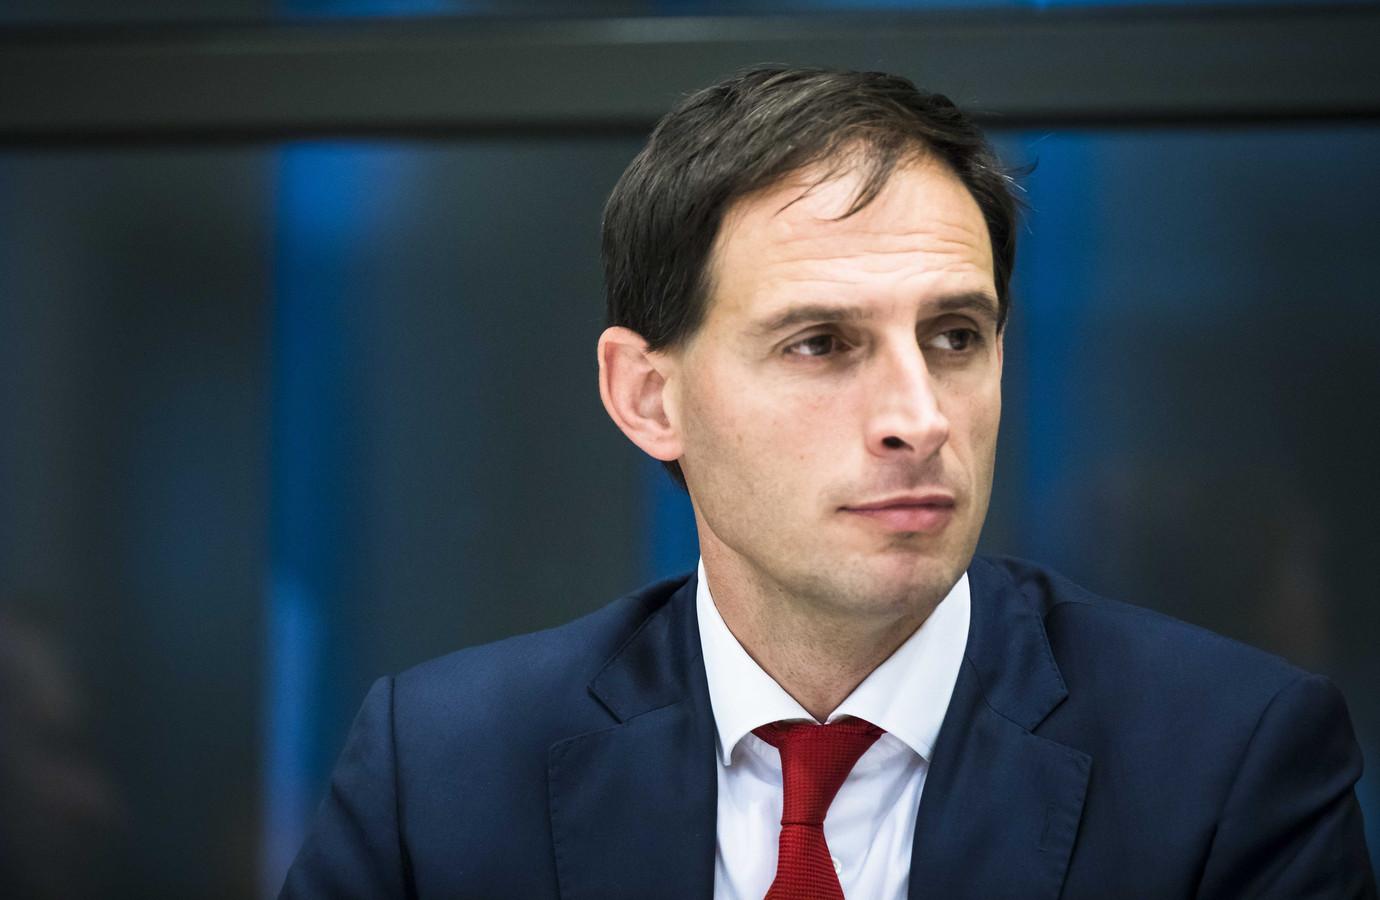 Minister Wopke Hoekstra van Financiën.